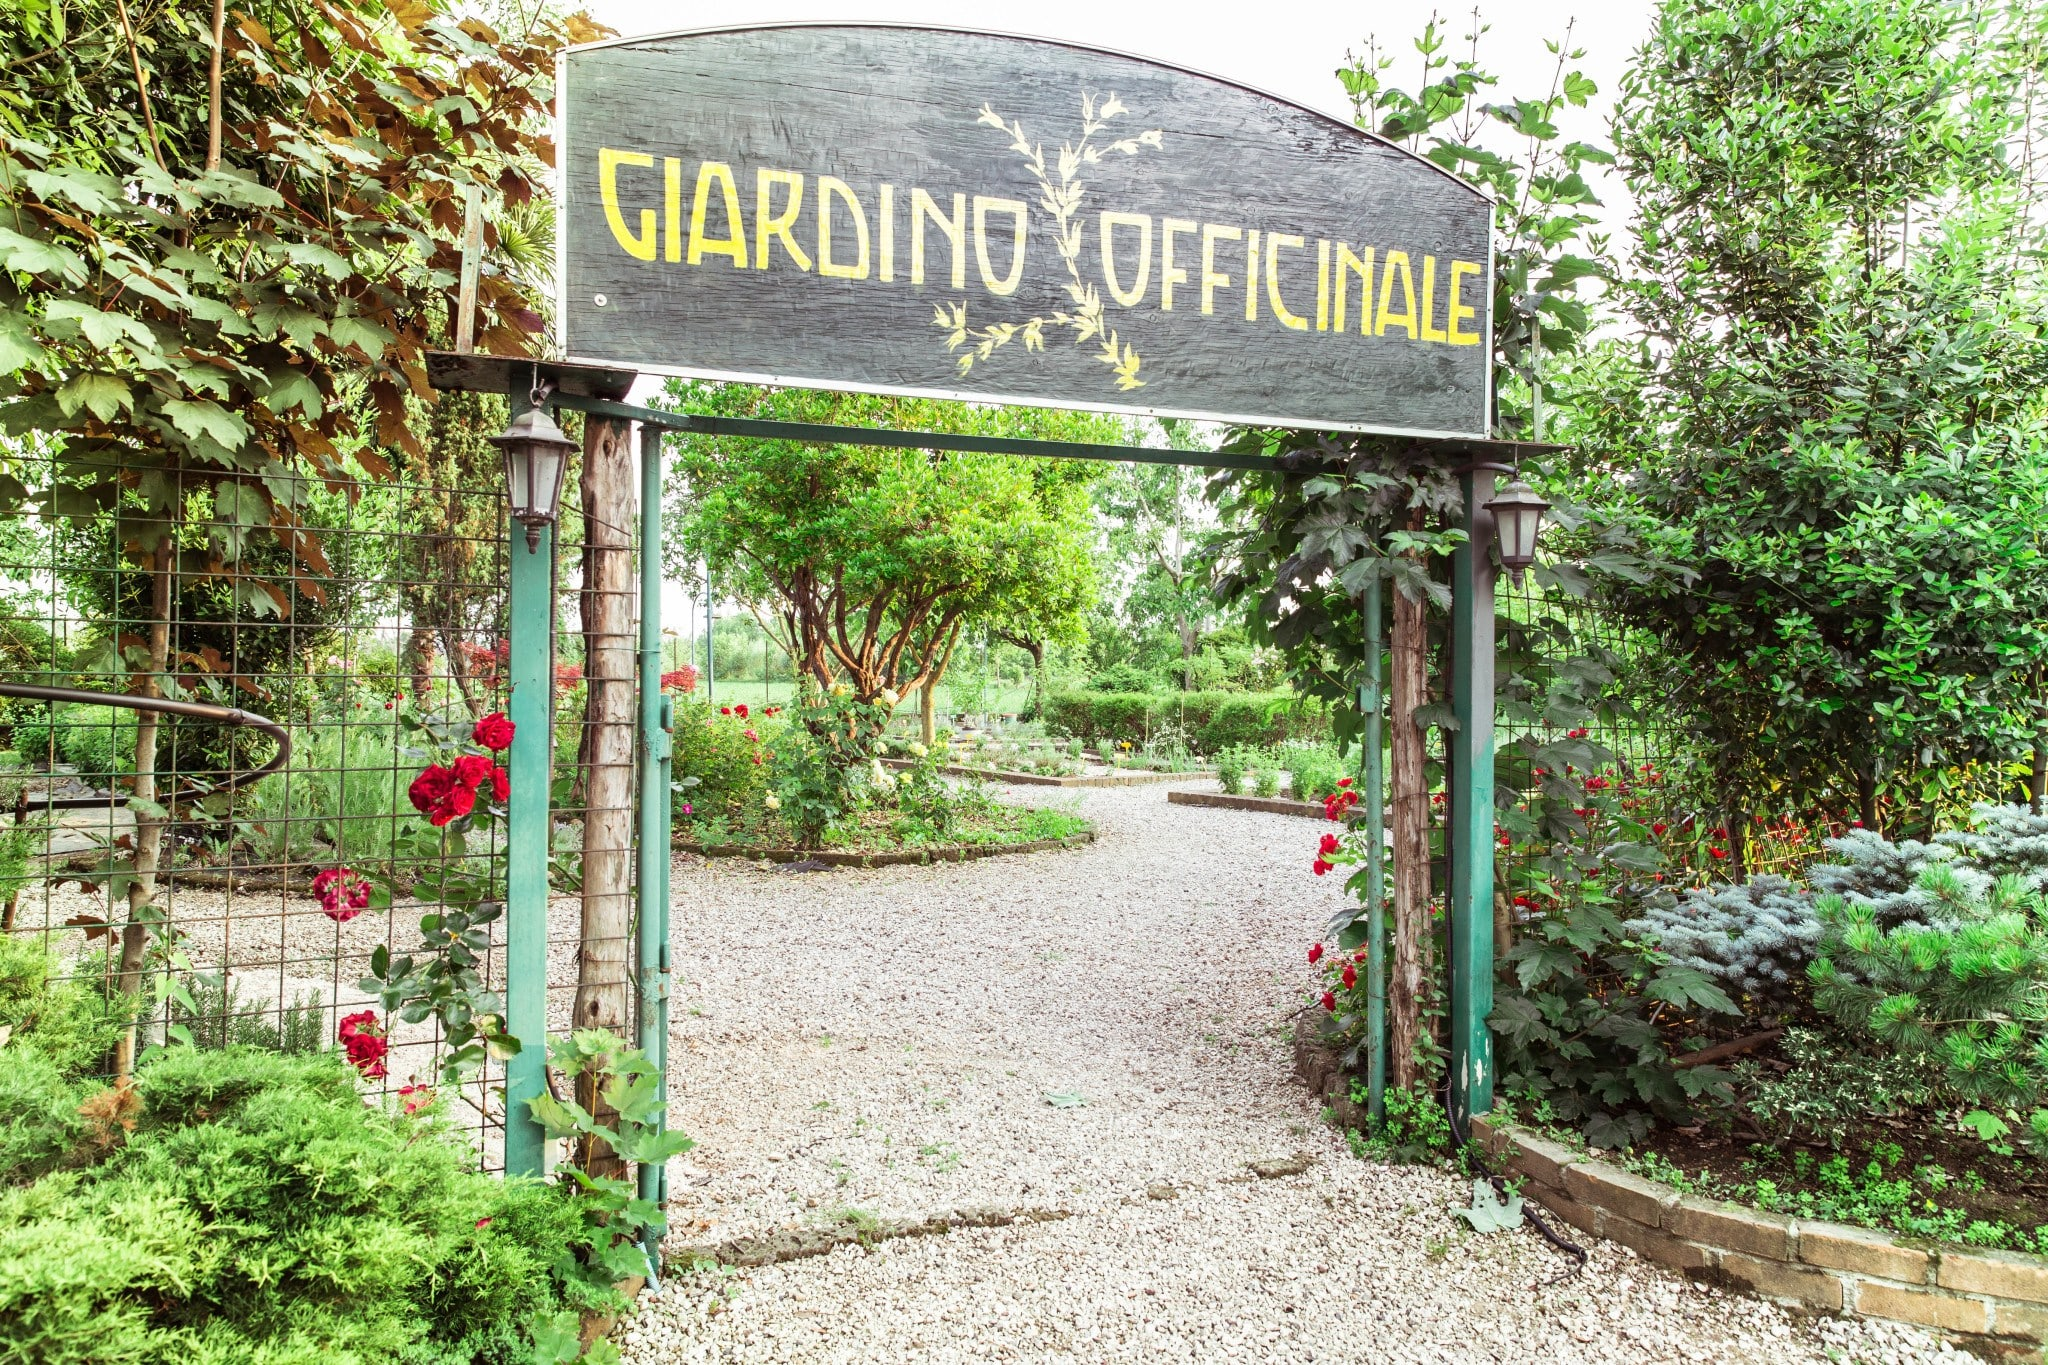 giardino_officinale54